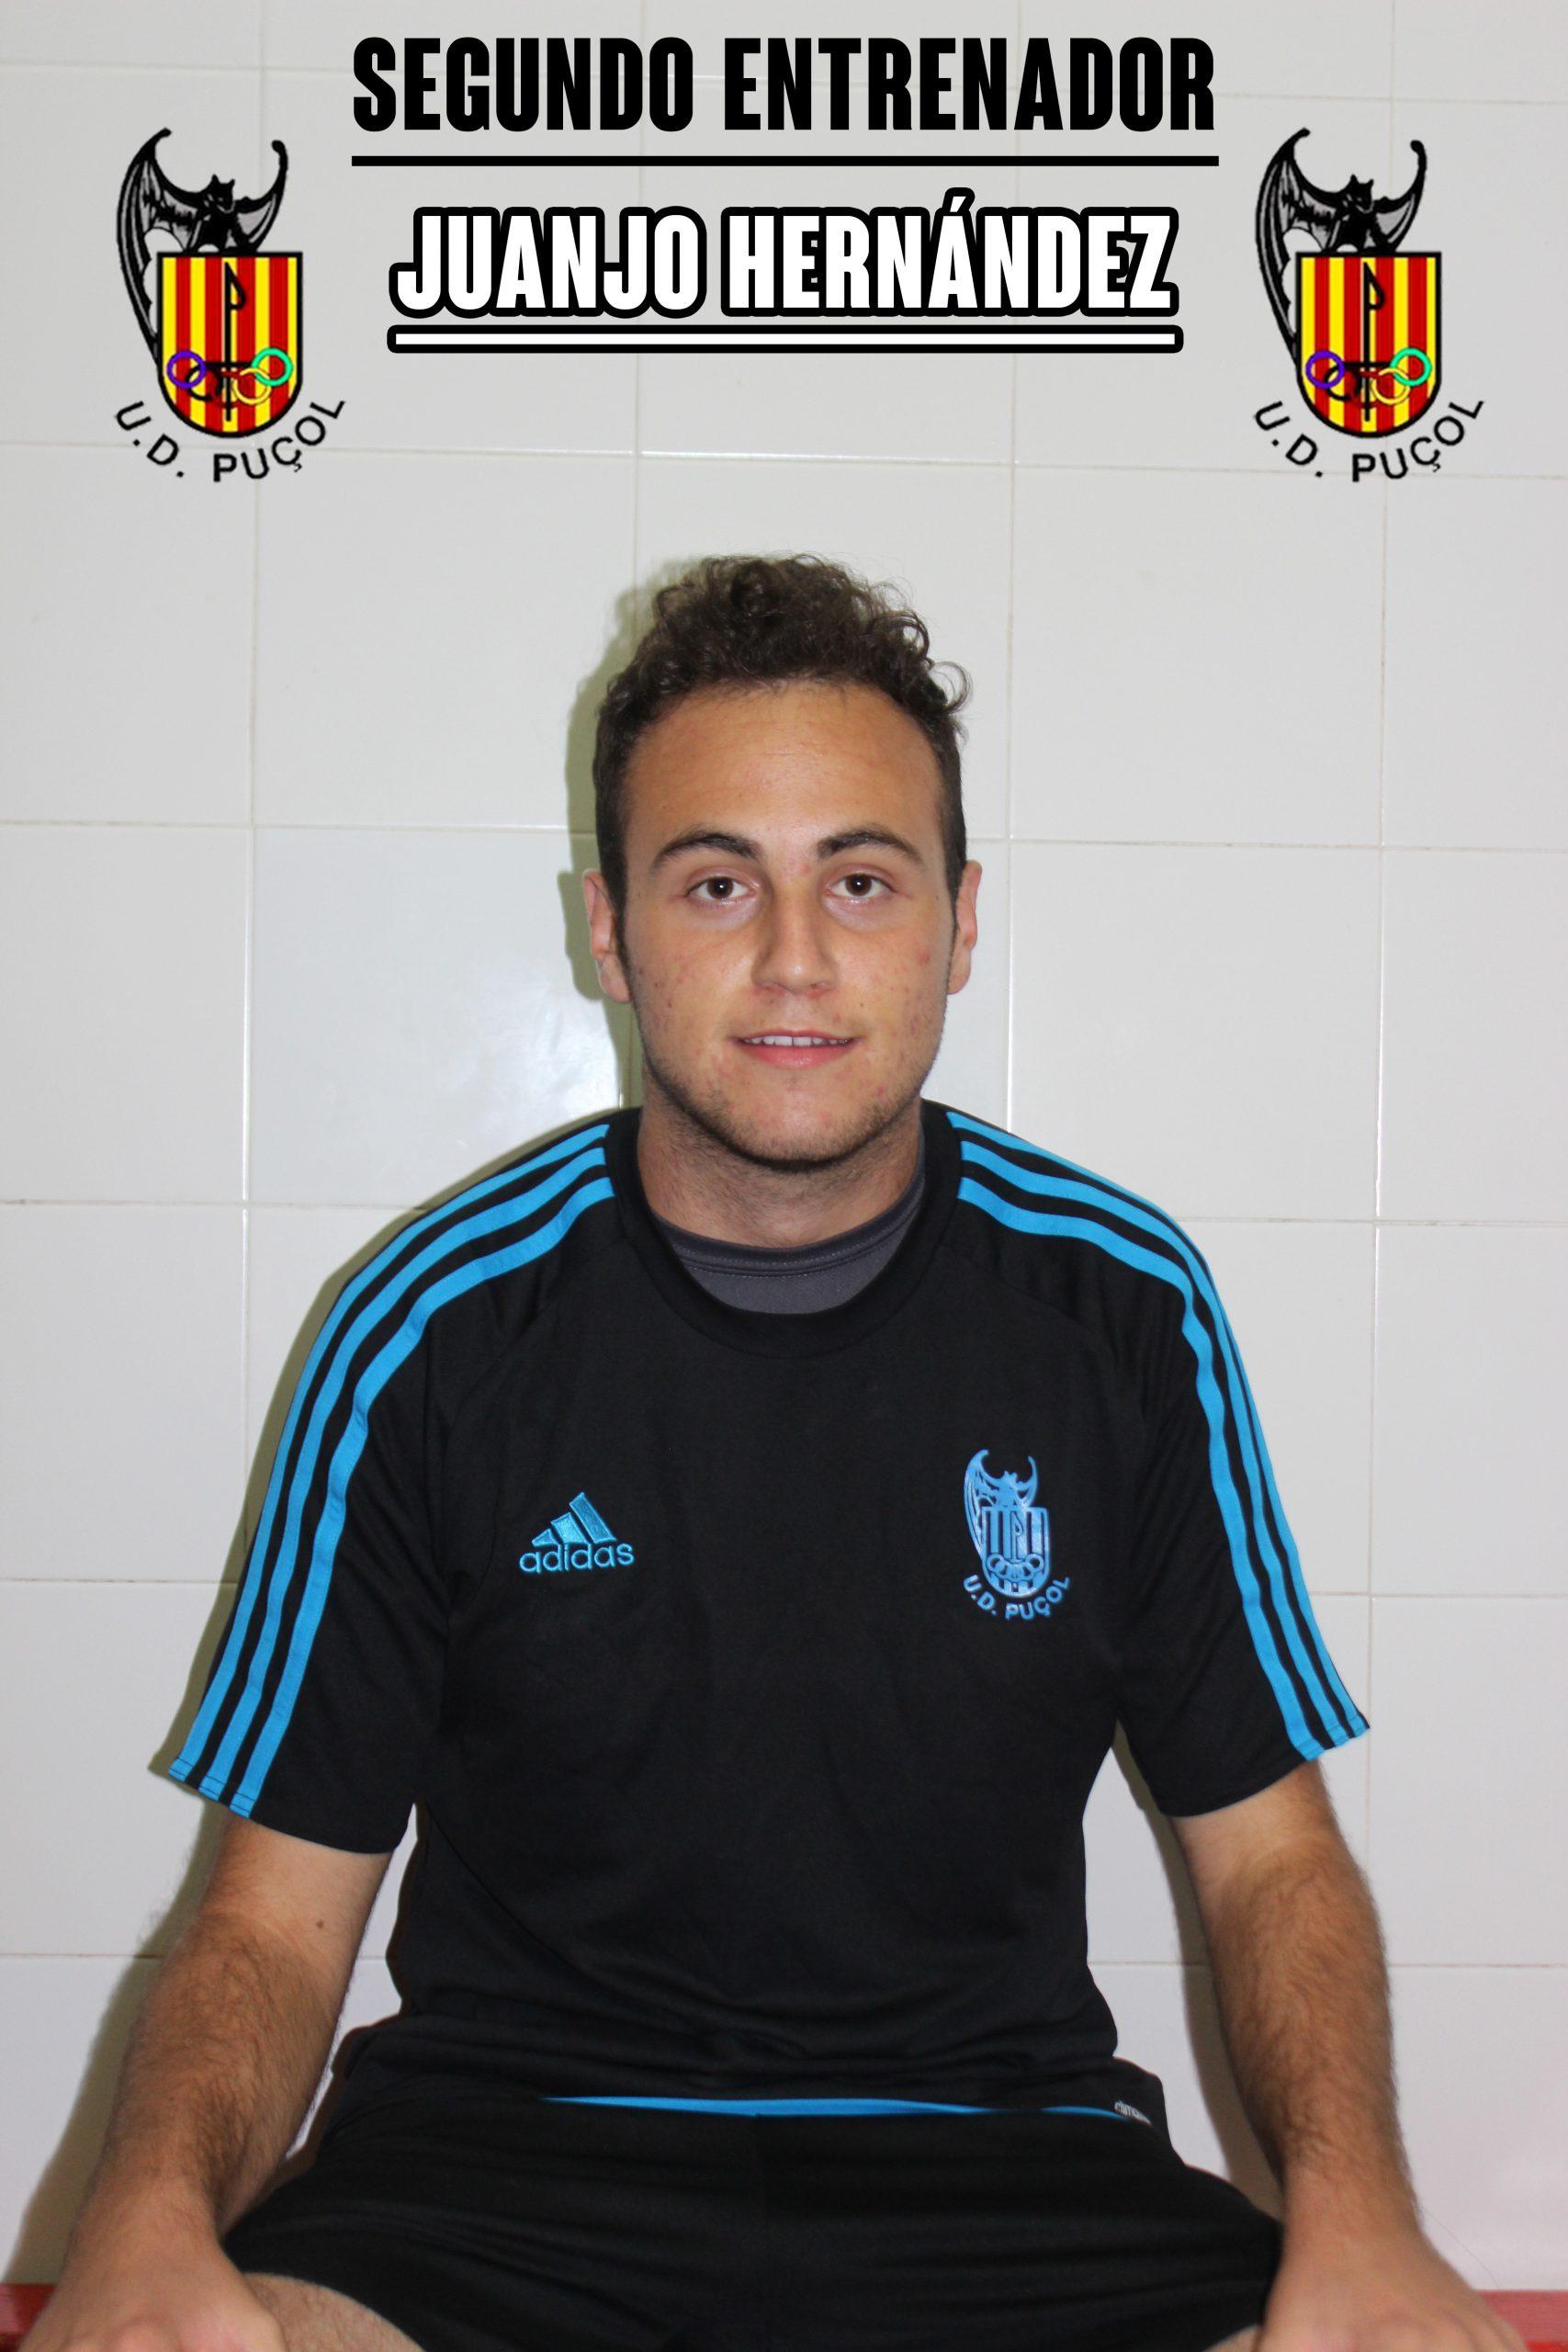 1_Juanjo_Hernández_Segundo_Entrenador